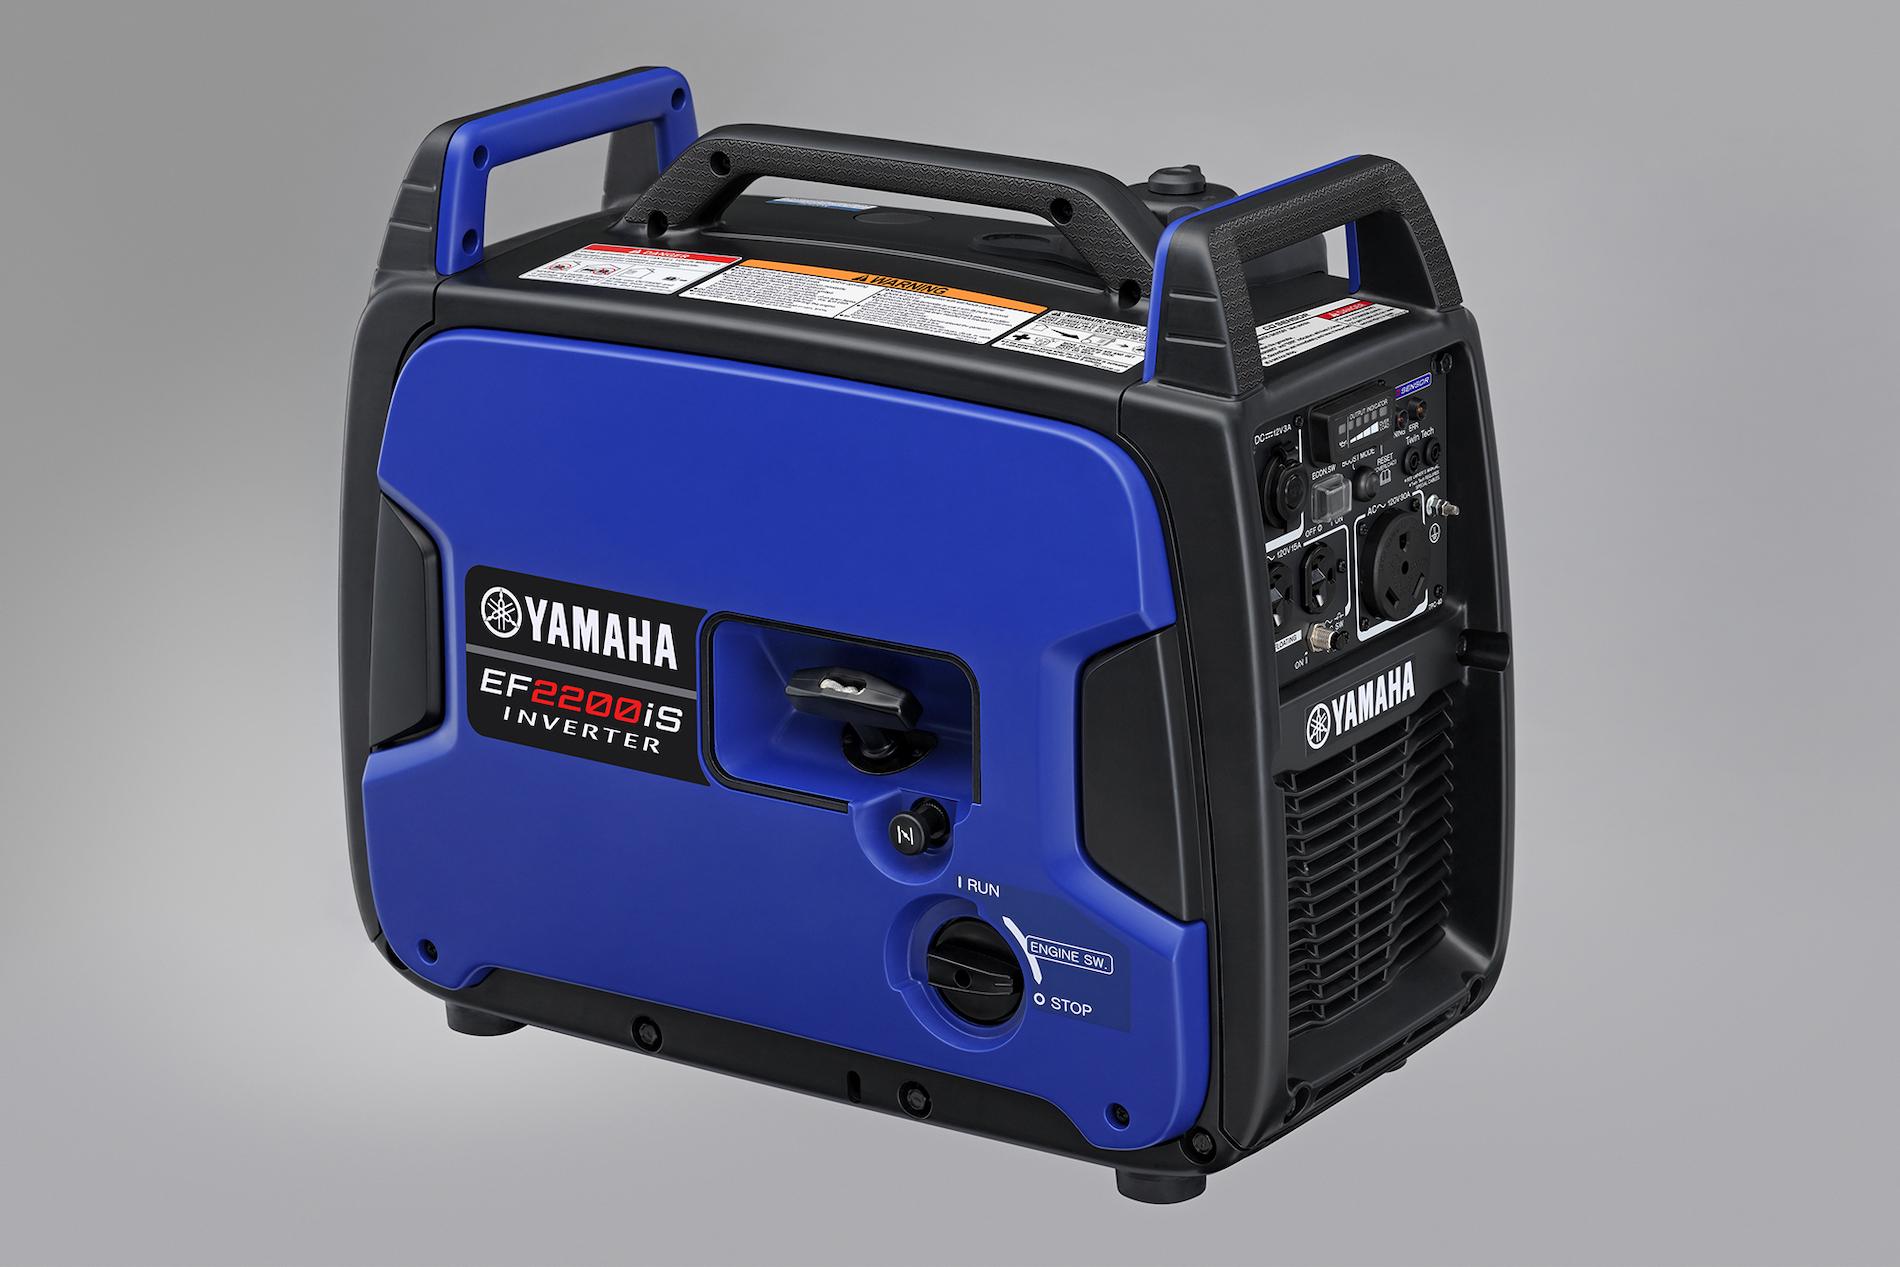 Yamaha EF2200iS portable generator side view